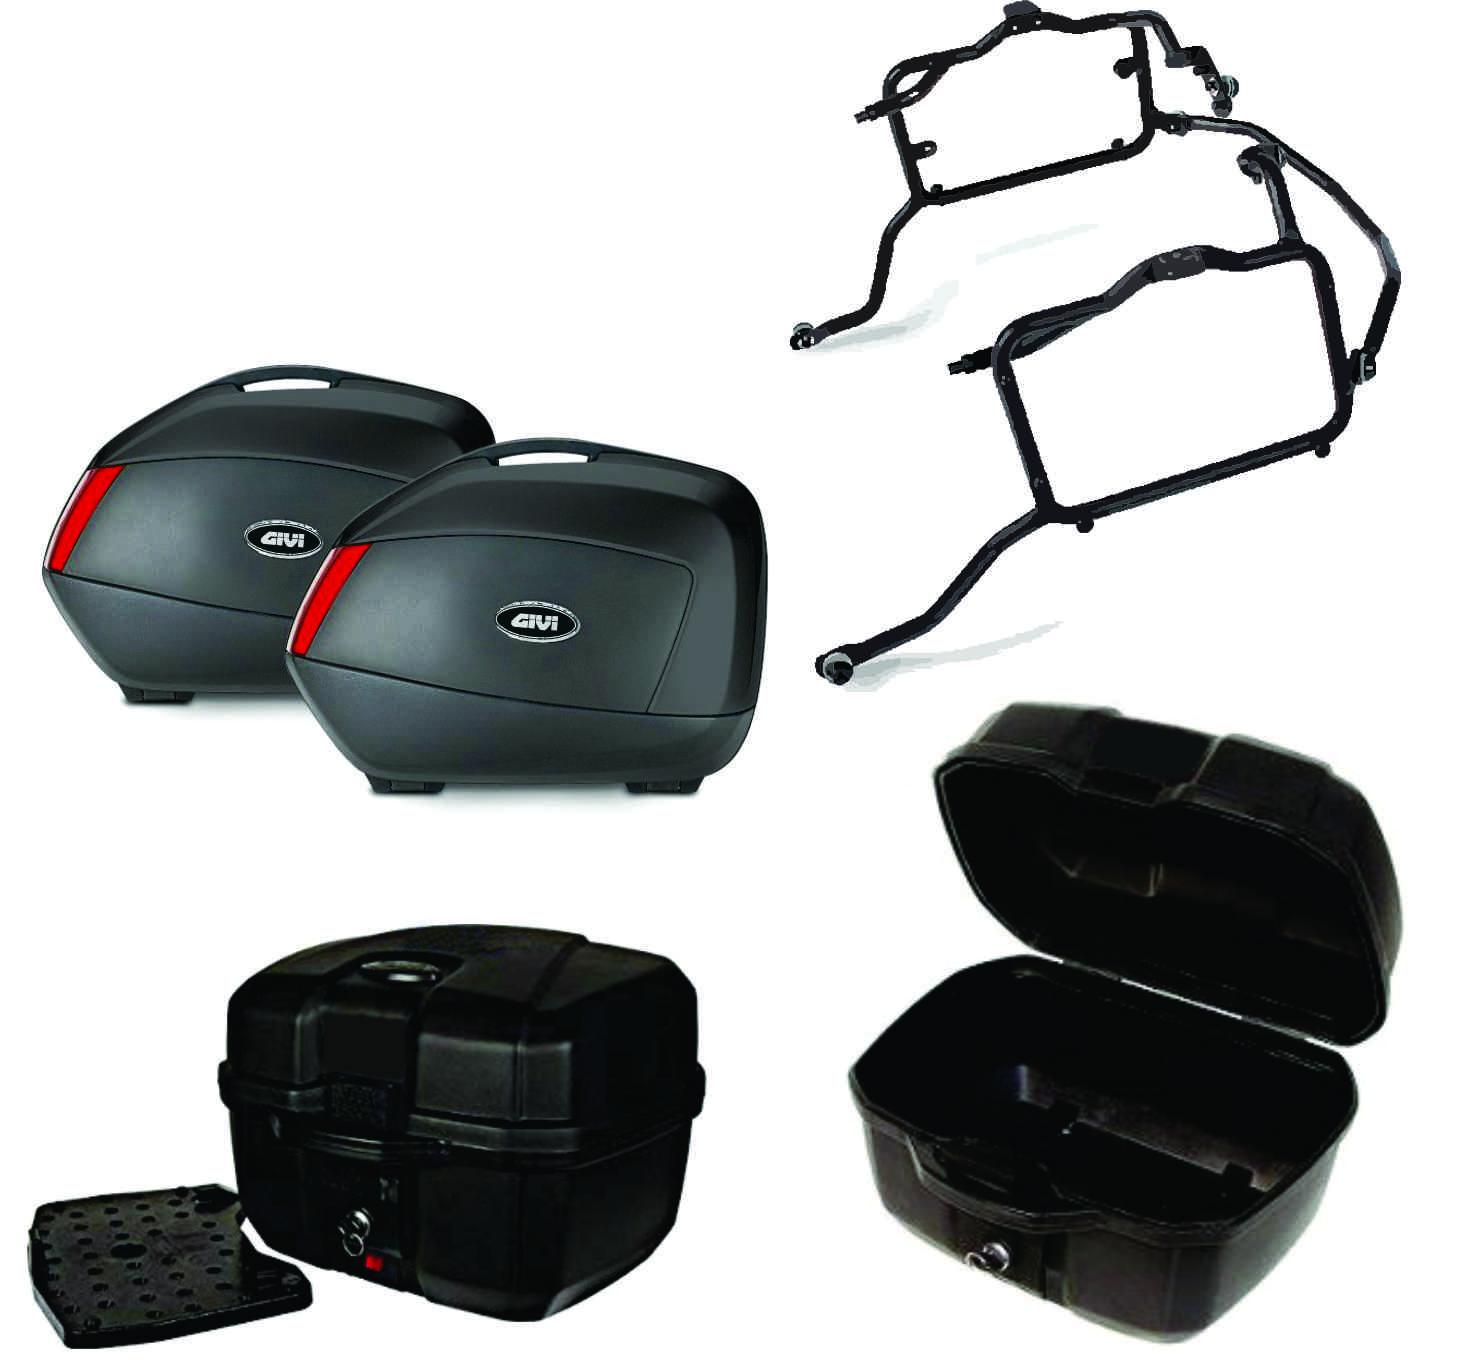 Pannier Set For Honda Nc 750 X Junk Mail